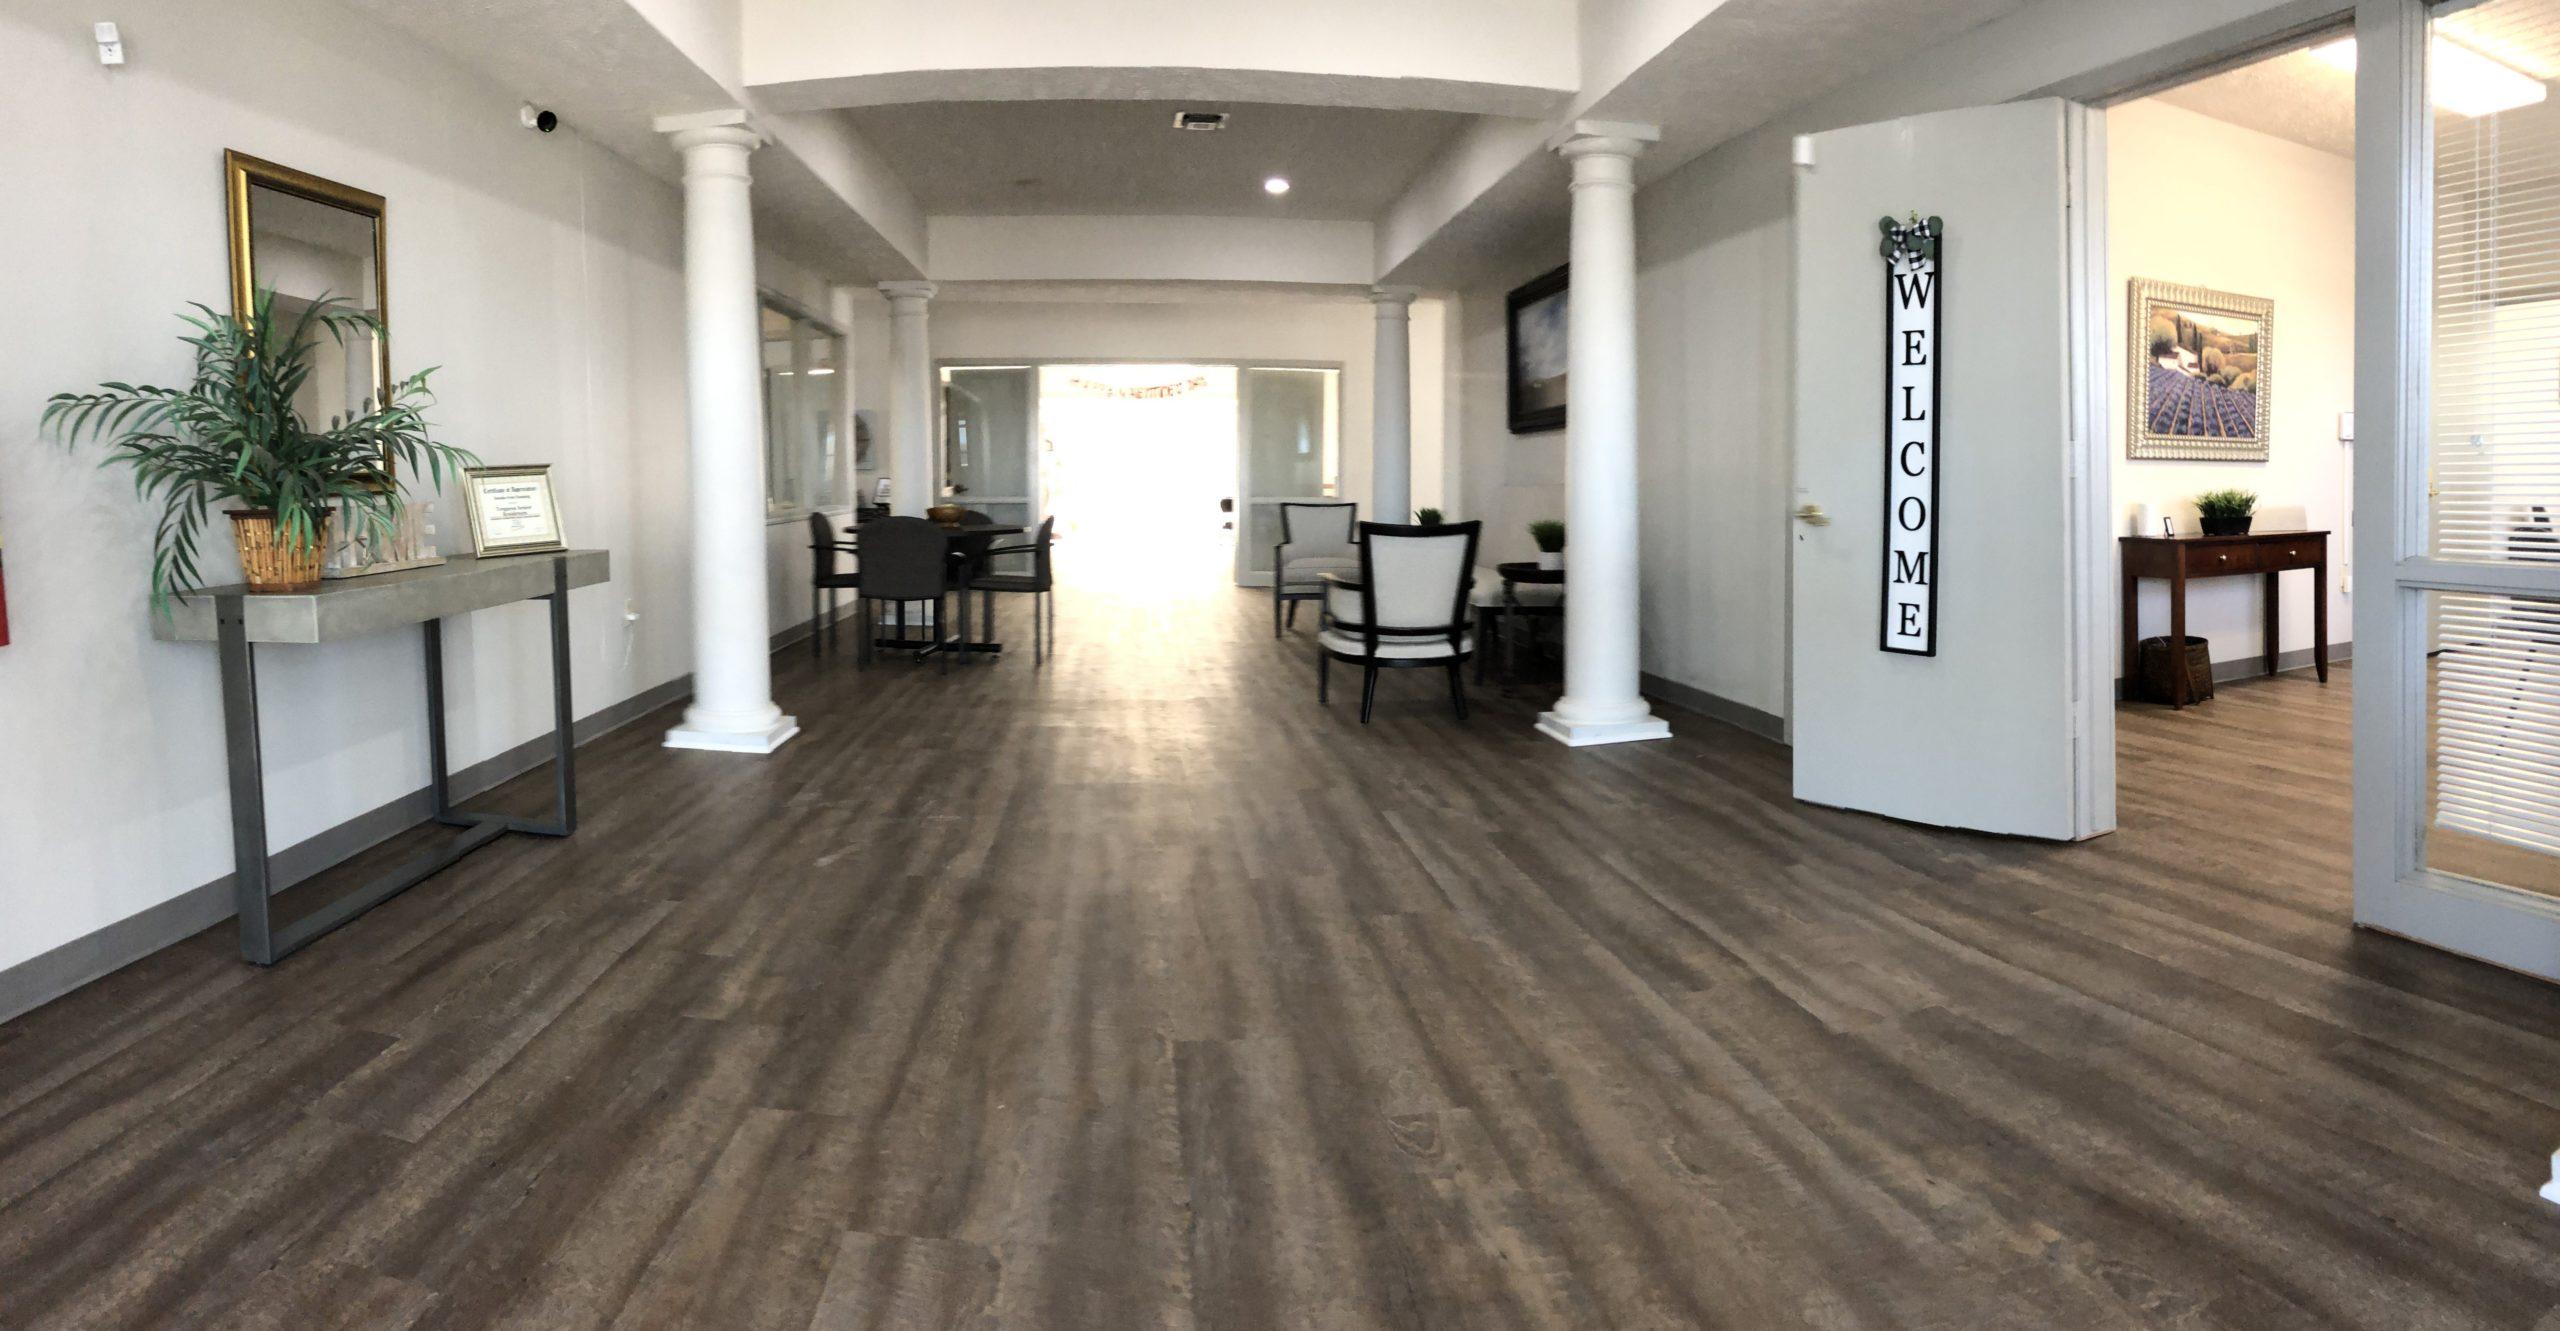 Tregaron Senior Residence Bellevue Nebraka lobby view